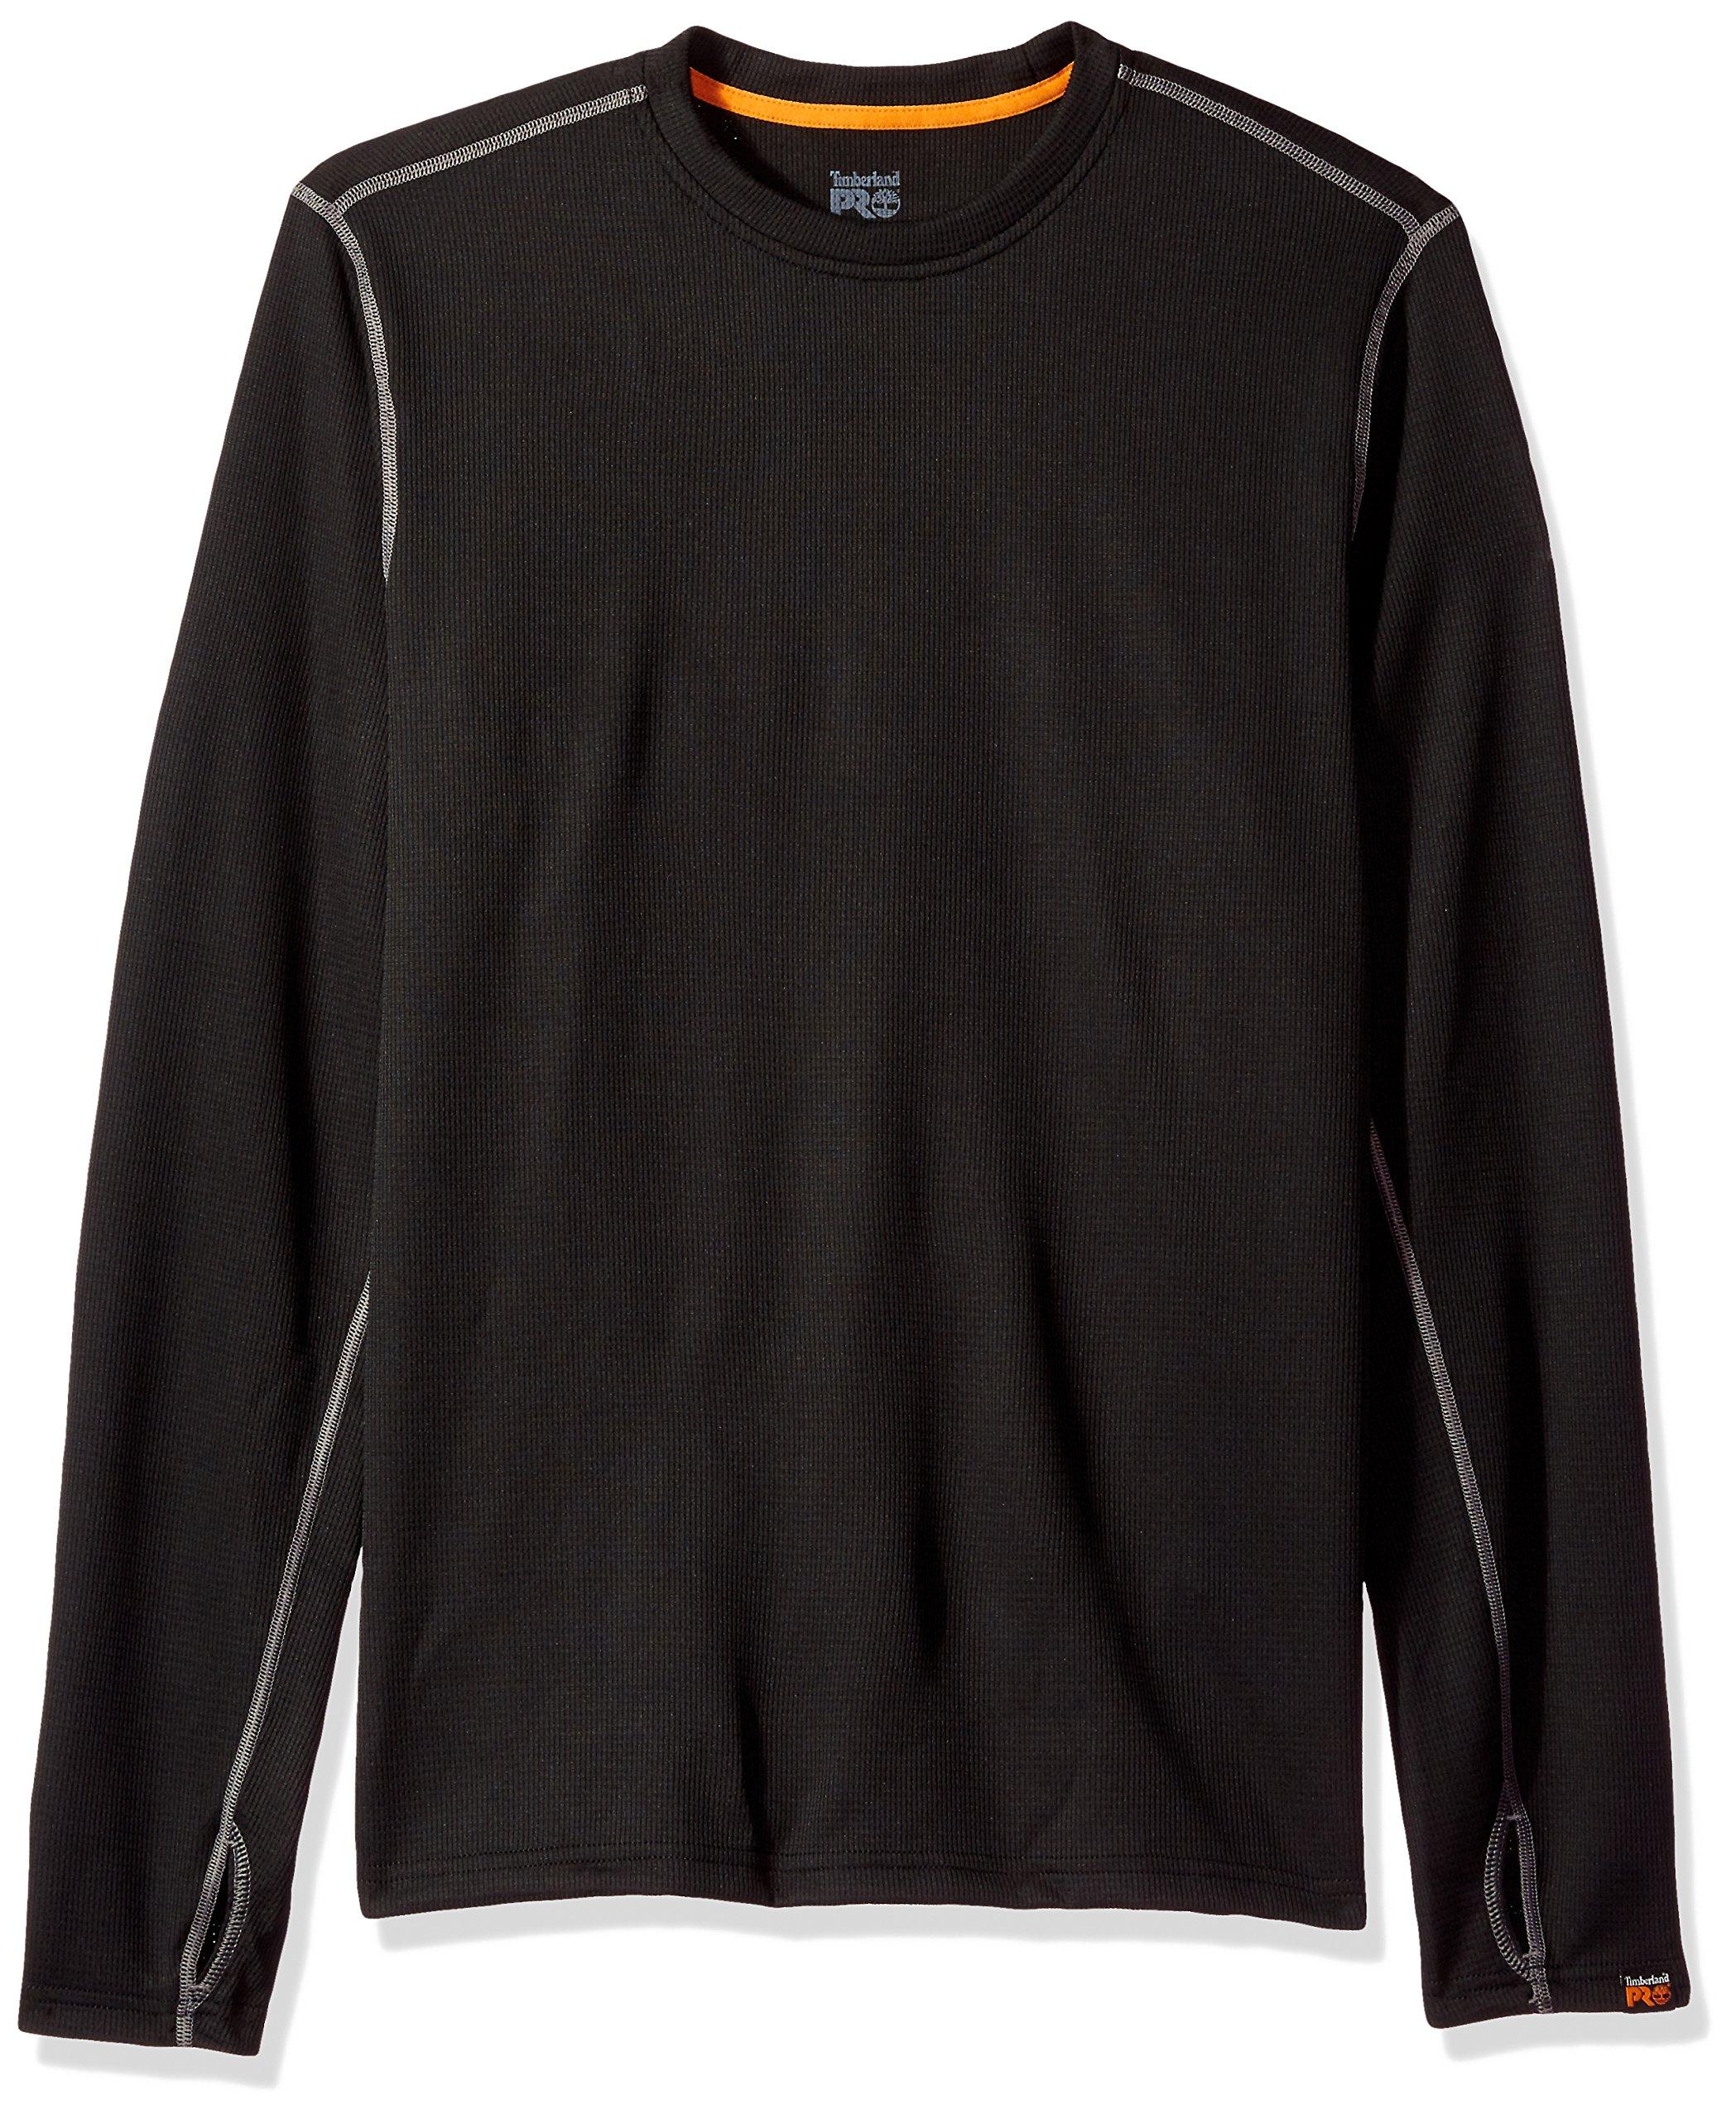 Timberland PRO Men's Skim Coat Light Thermal Top, Jet Black, Medium